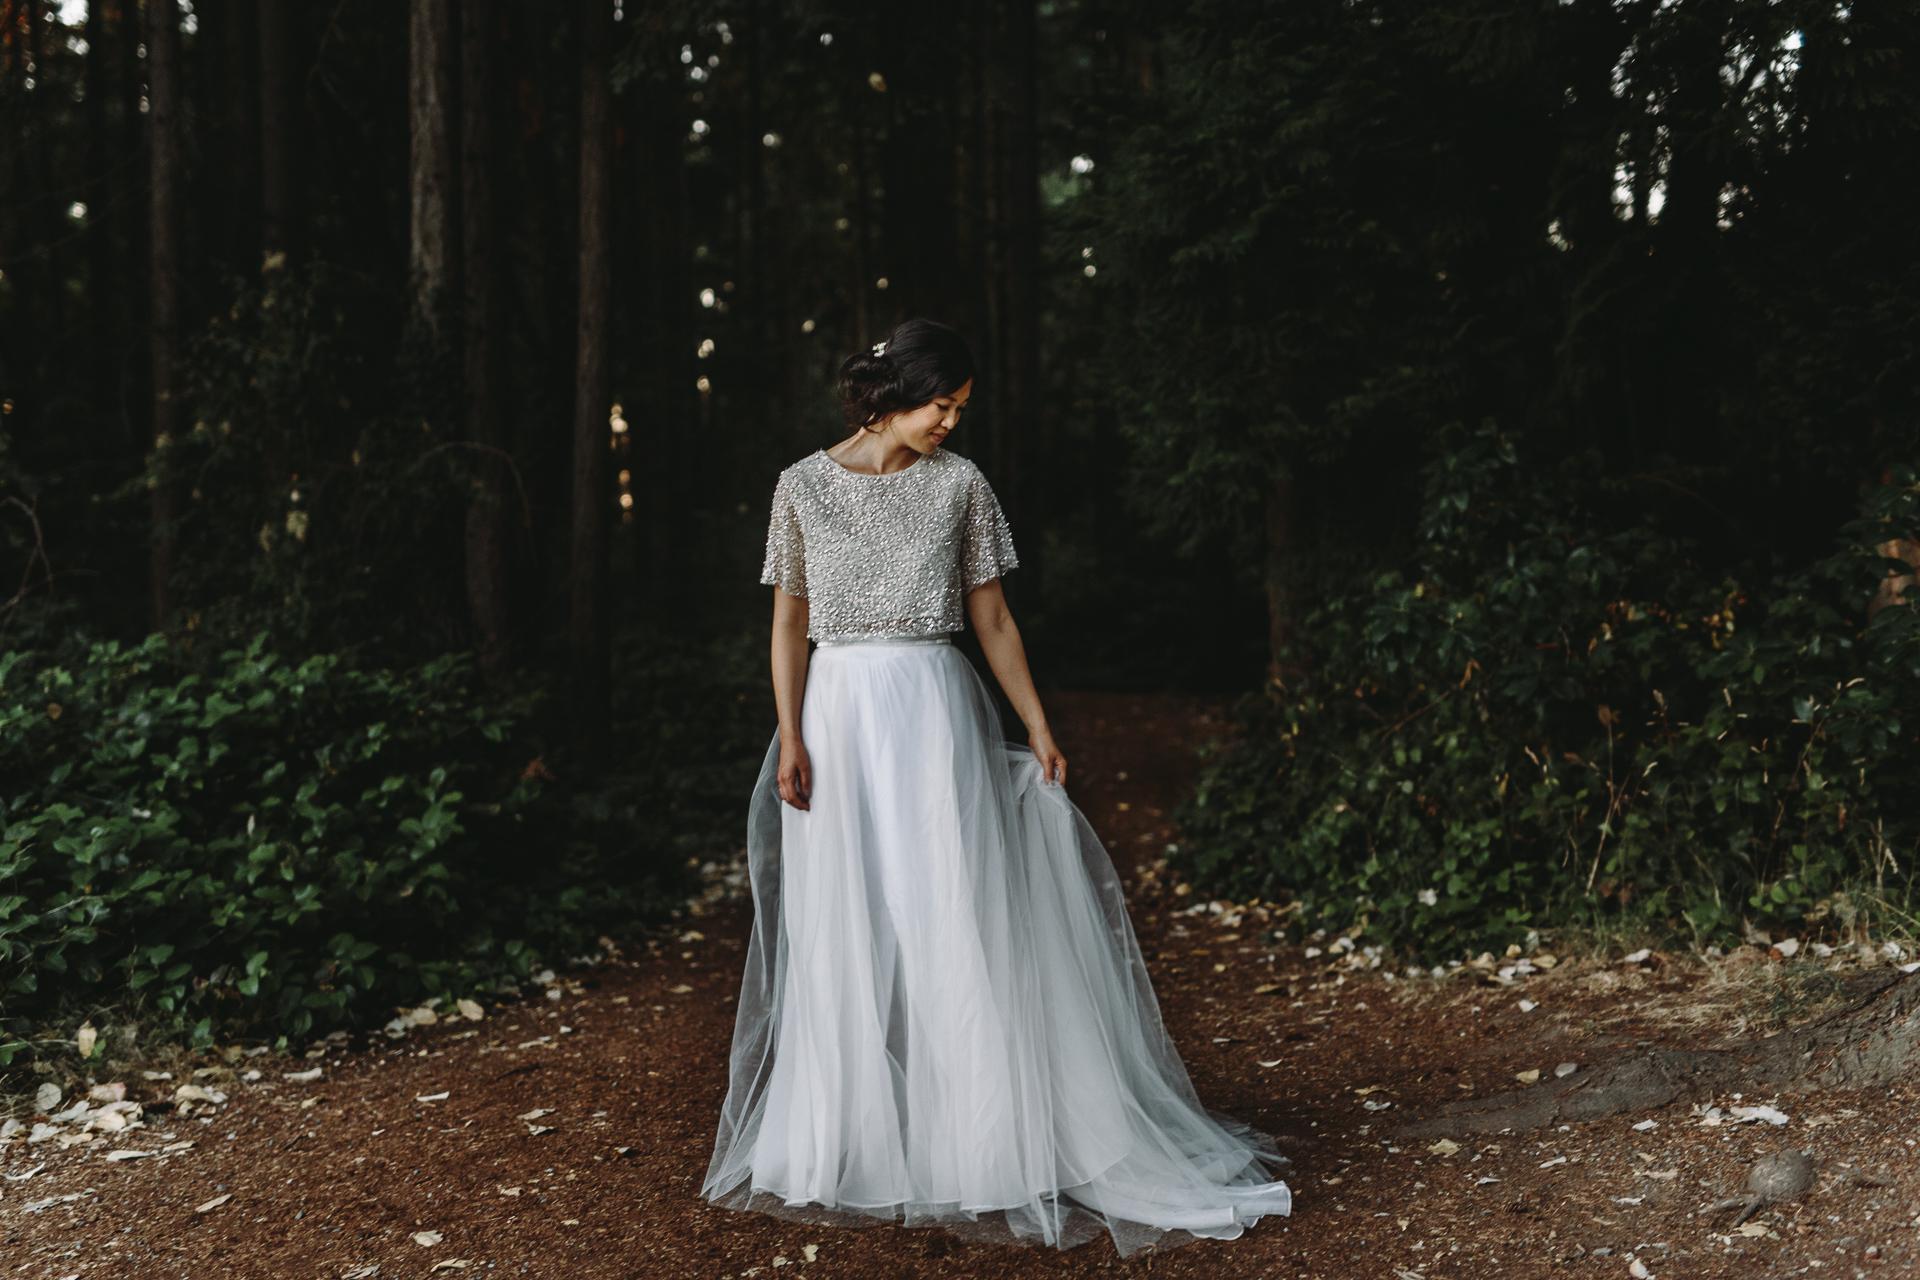 jess-hunter-seattle-artistic-wedding-photographer-5976.jpg